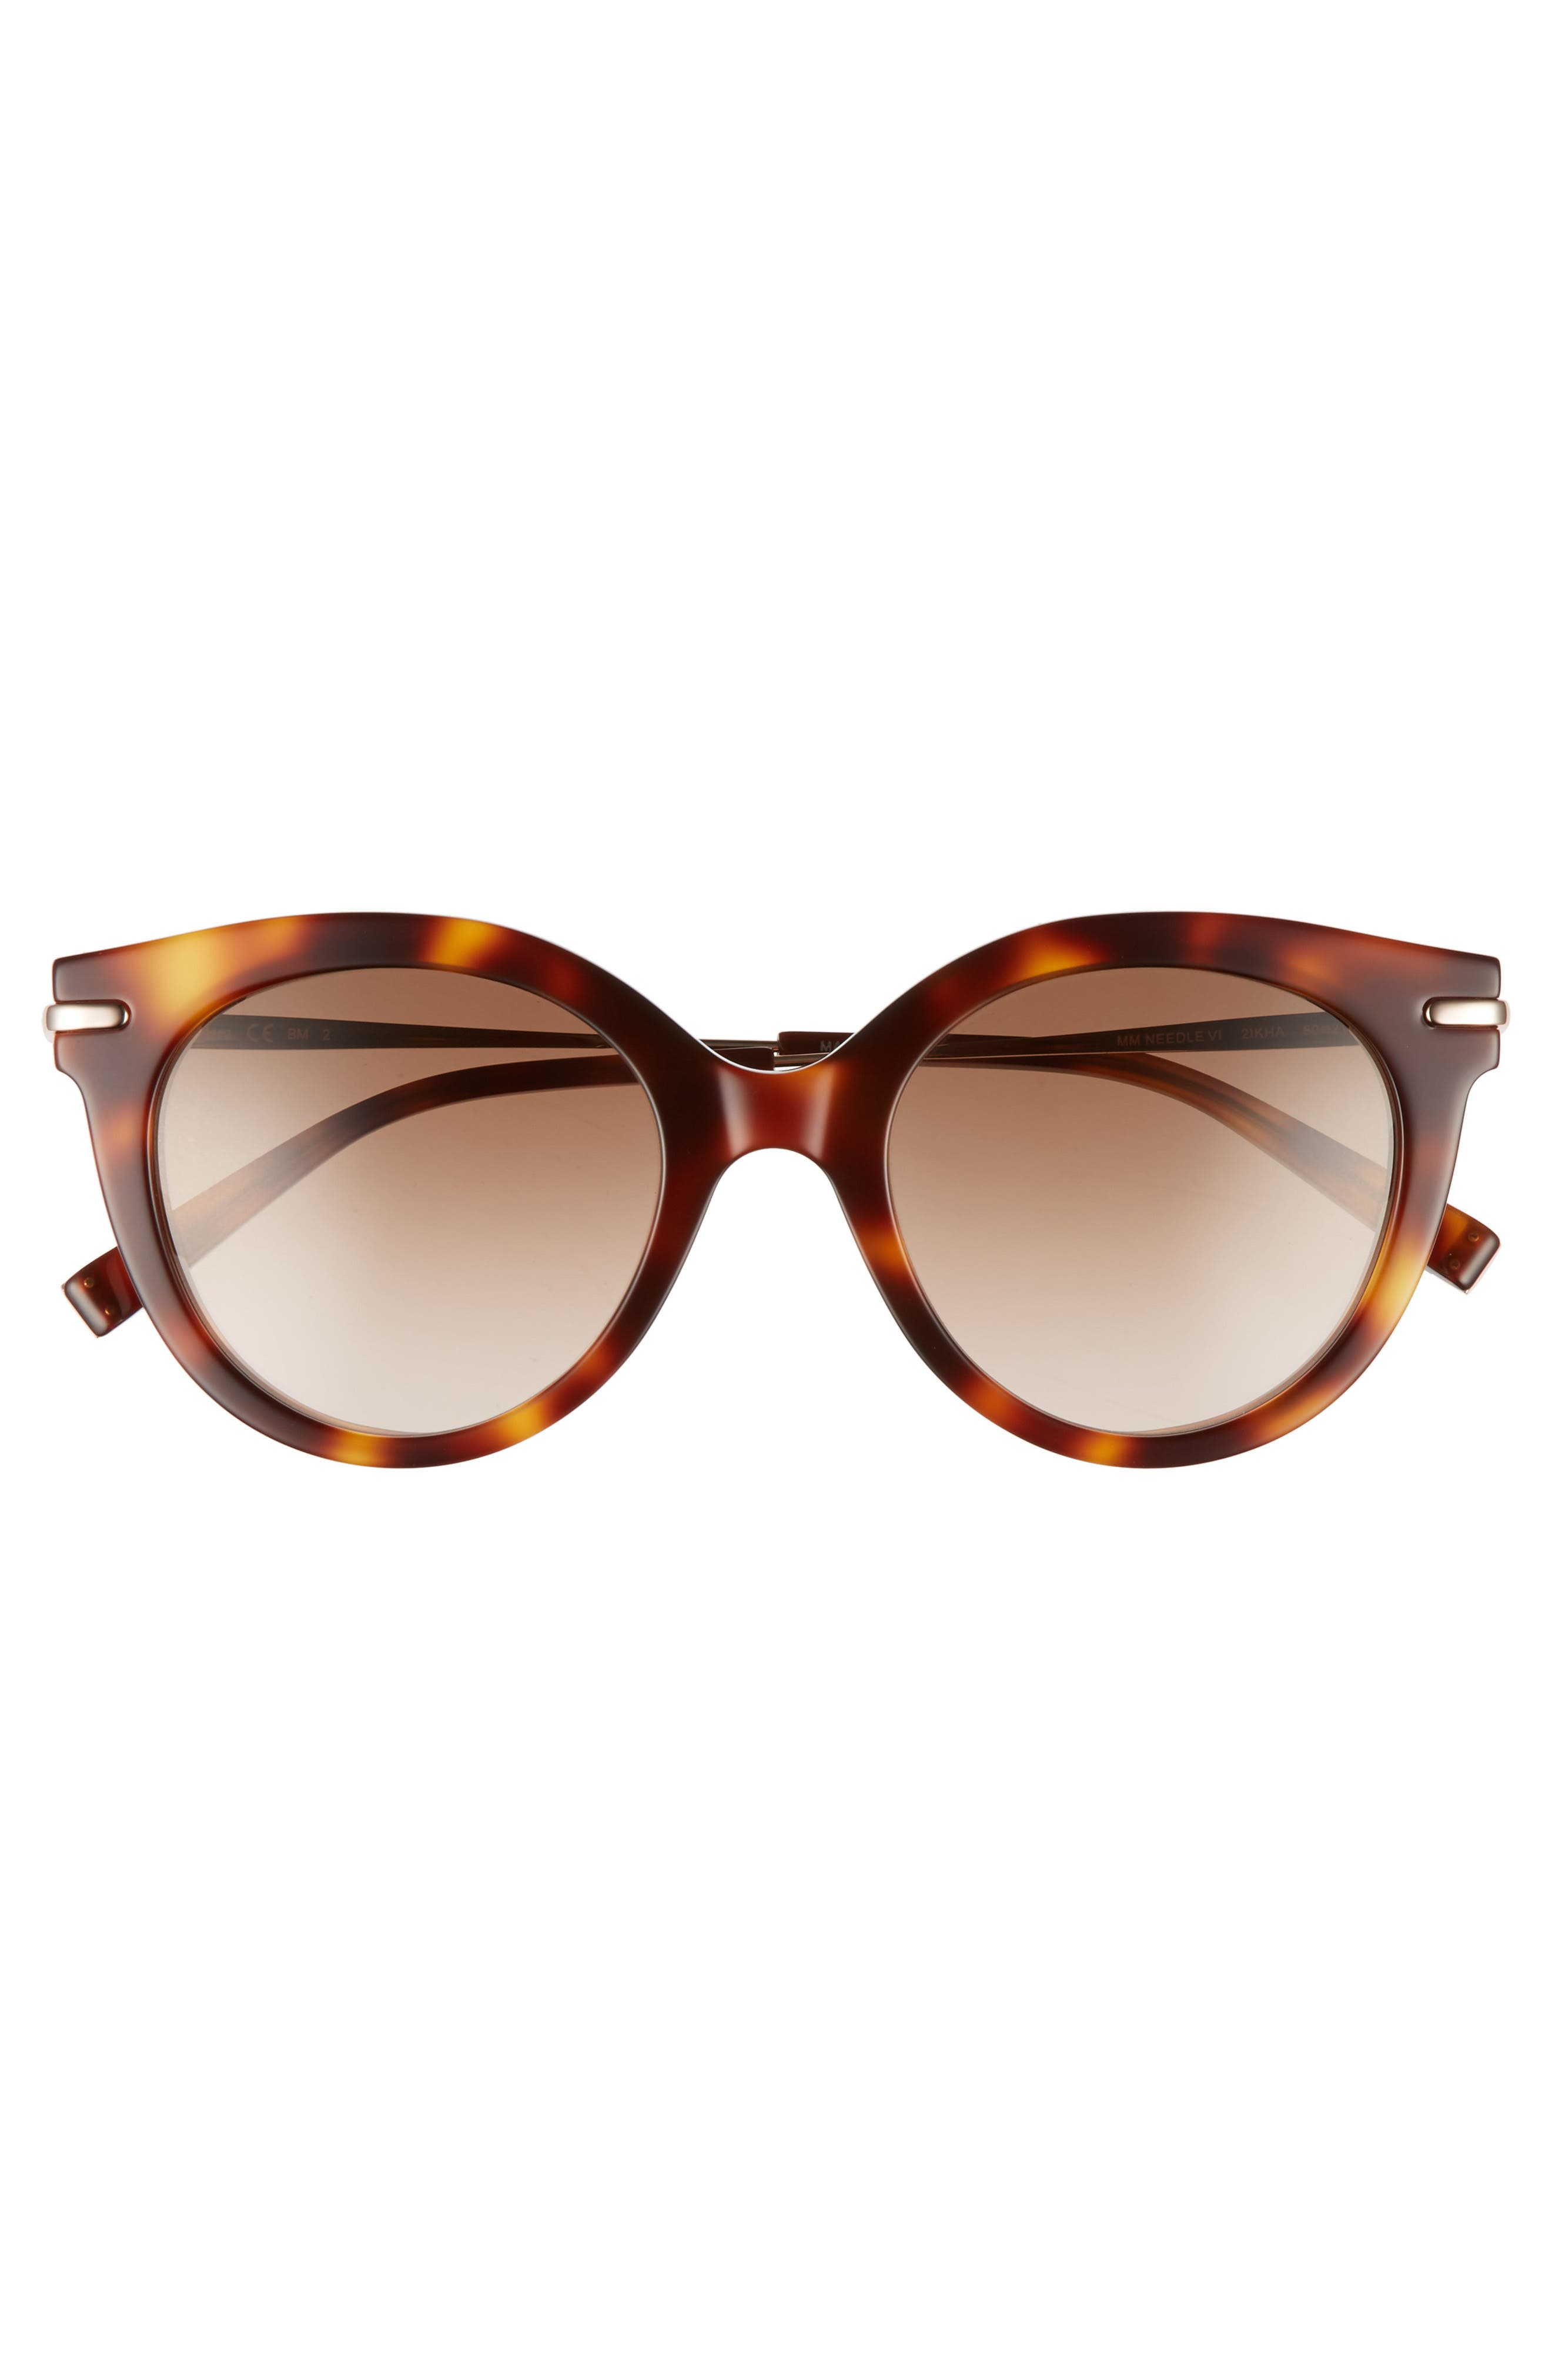 Needle VI 50mm Gradient Round Sunglasses,                             Alternate thumbnail 3, color,                             Havana Gold